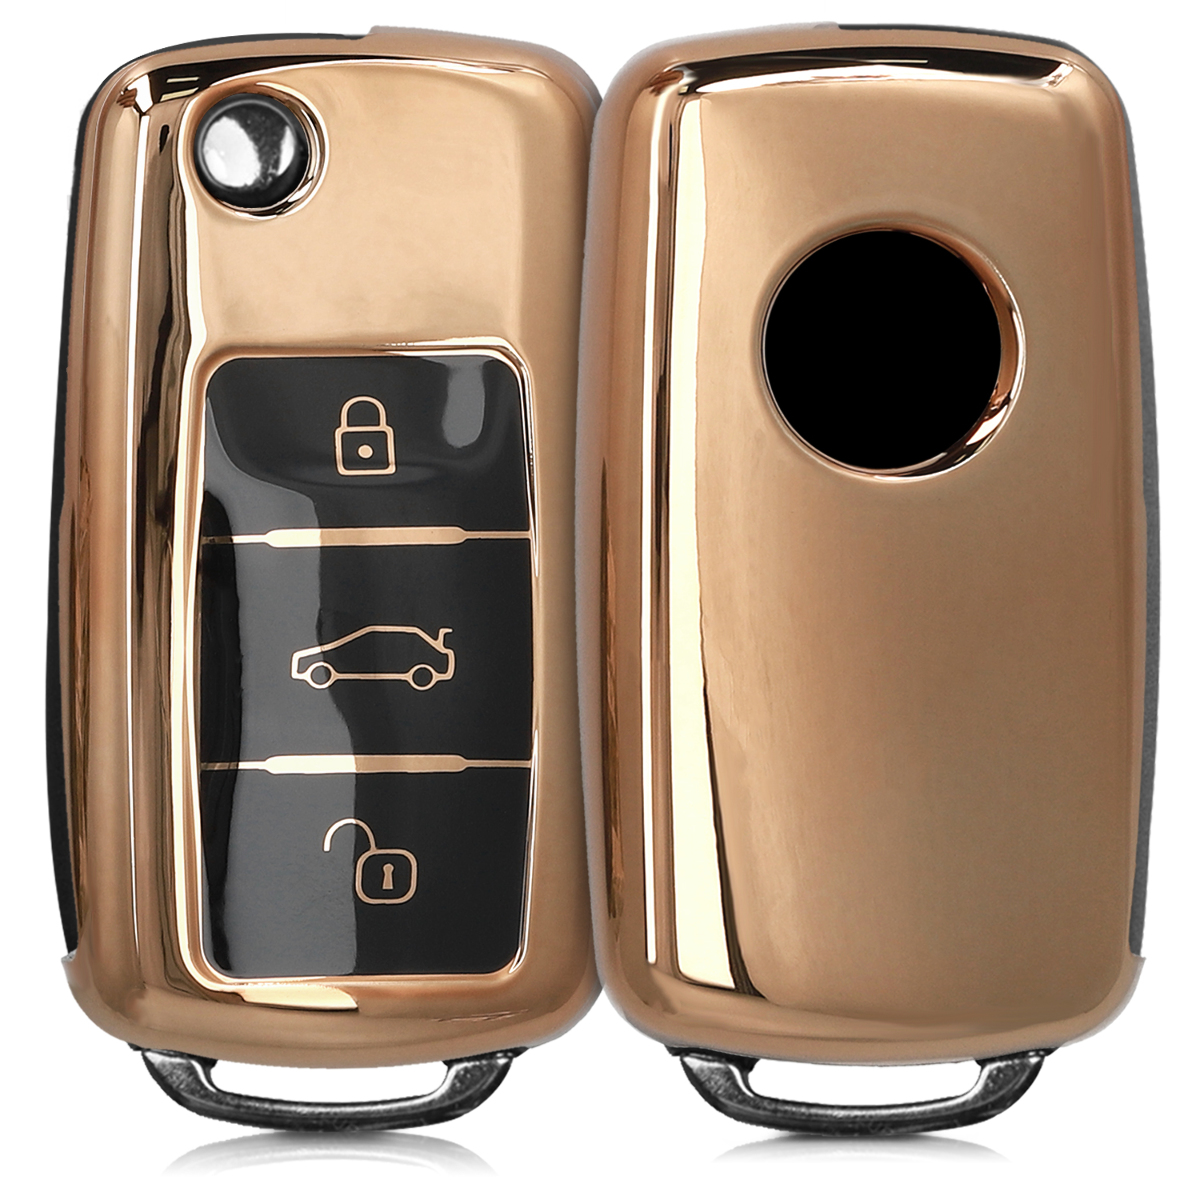 KW Θήκη Κλειδιού VW Skoda Seat - Σιλικόνη - 3 Κουμπιά - Gold High Gloss ( 48036.92)